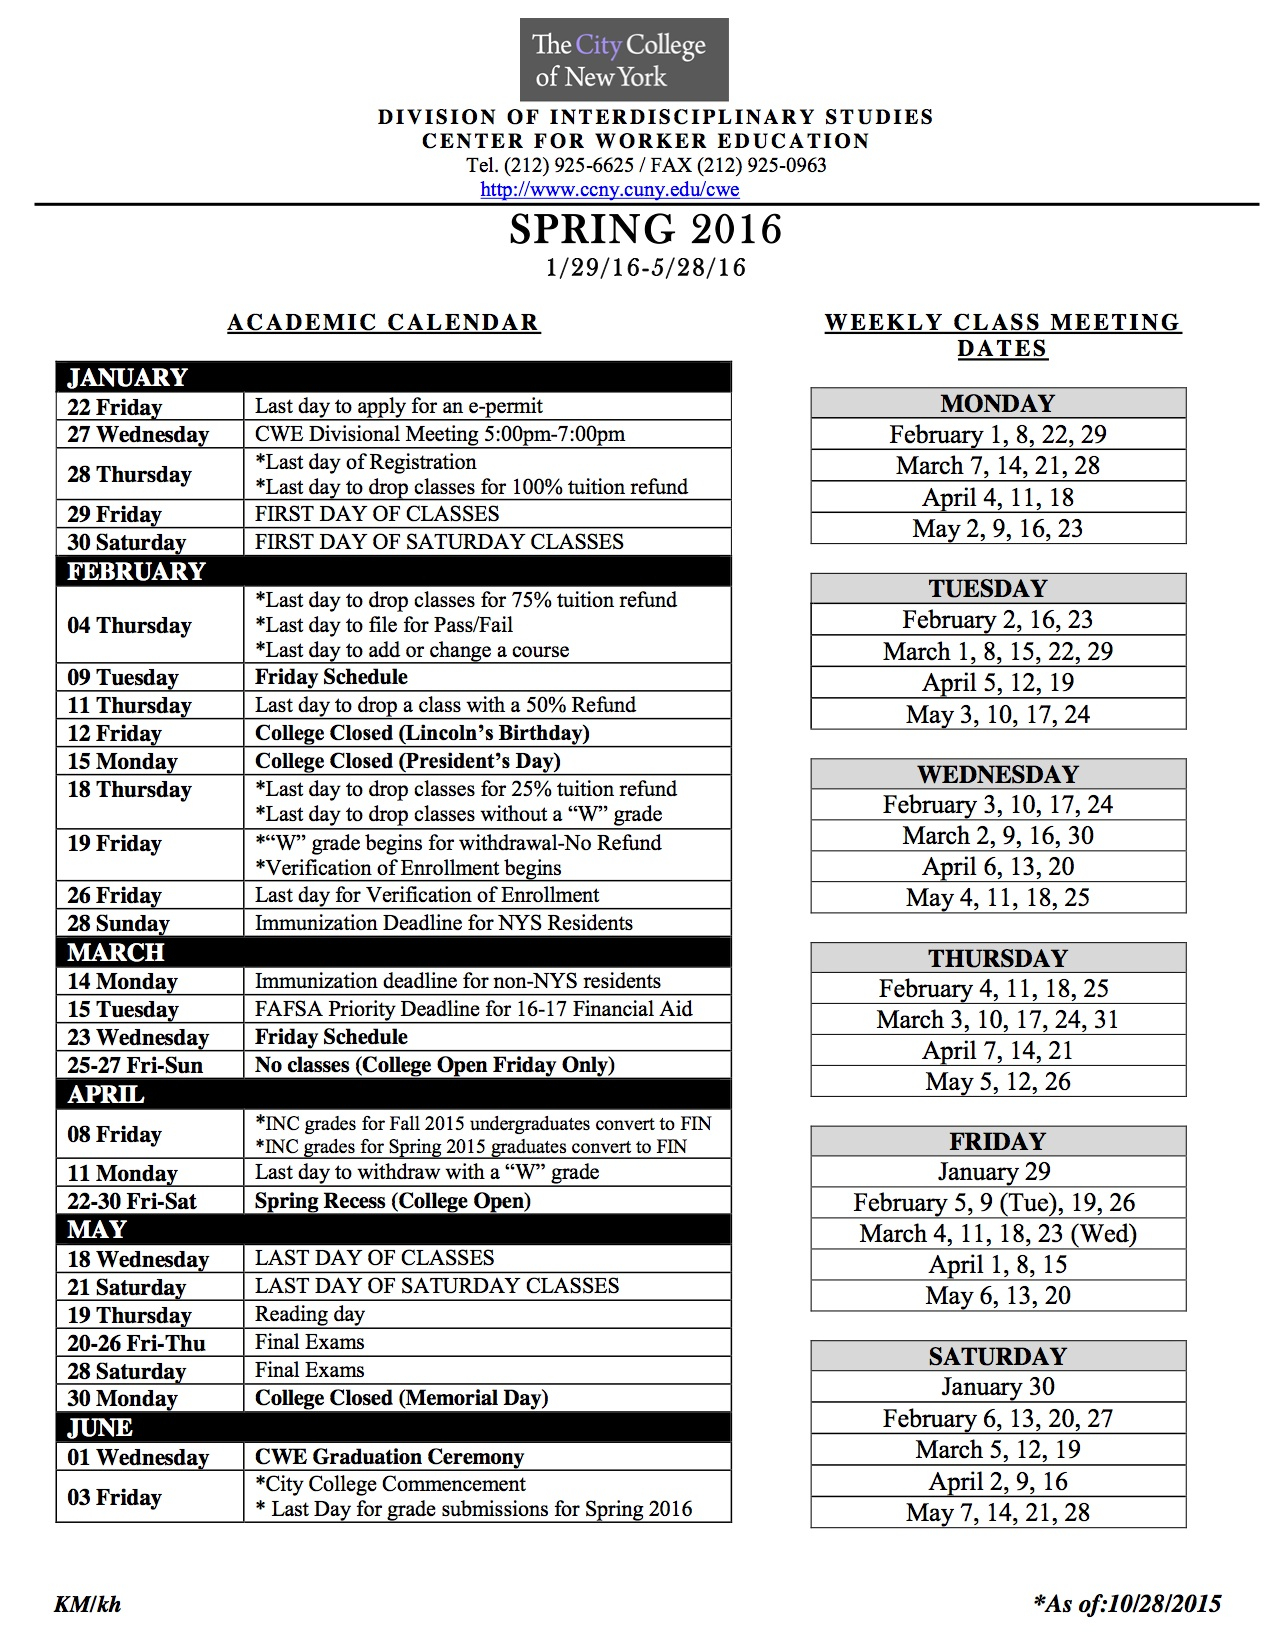 Academic Calendar | The City College Of New York Within Nyc Doe Calendar 2014